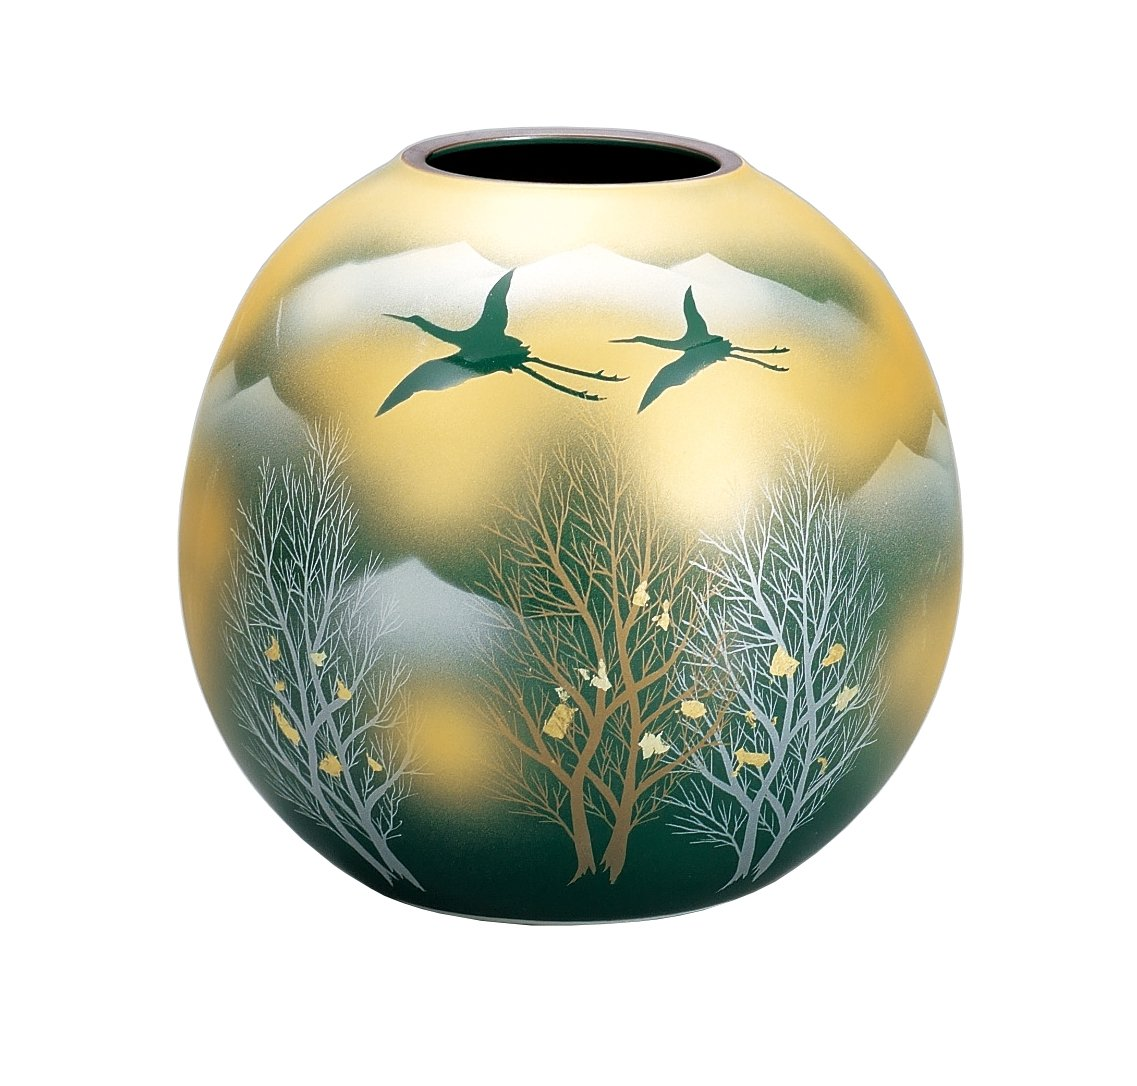 マルサン宮本 九谷焼 花器 5.5号花瓶 金雲木立連山 AP3-1036 B01HXQJWPC